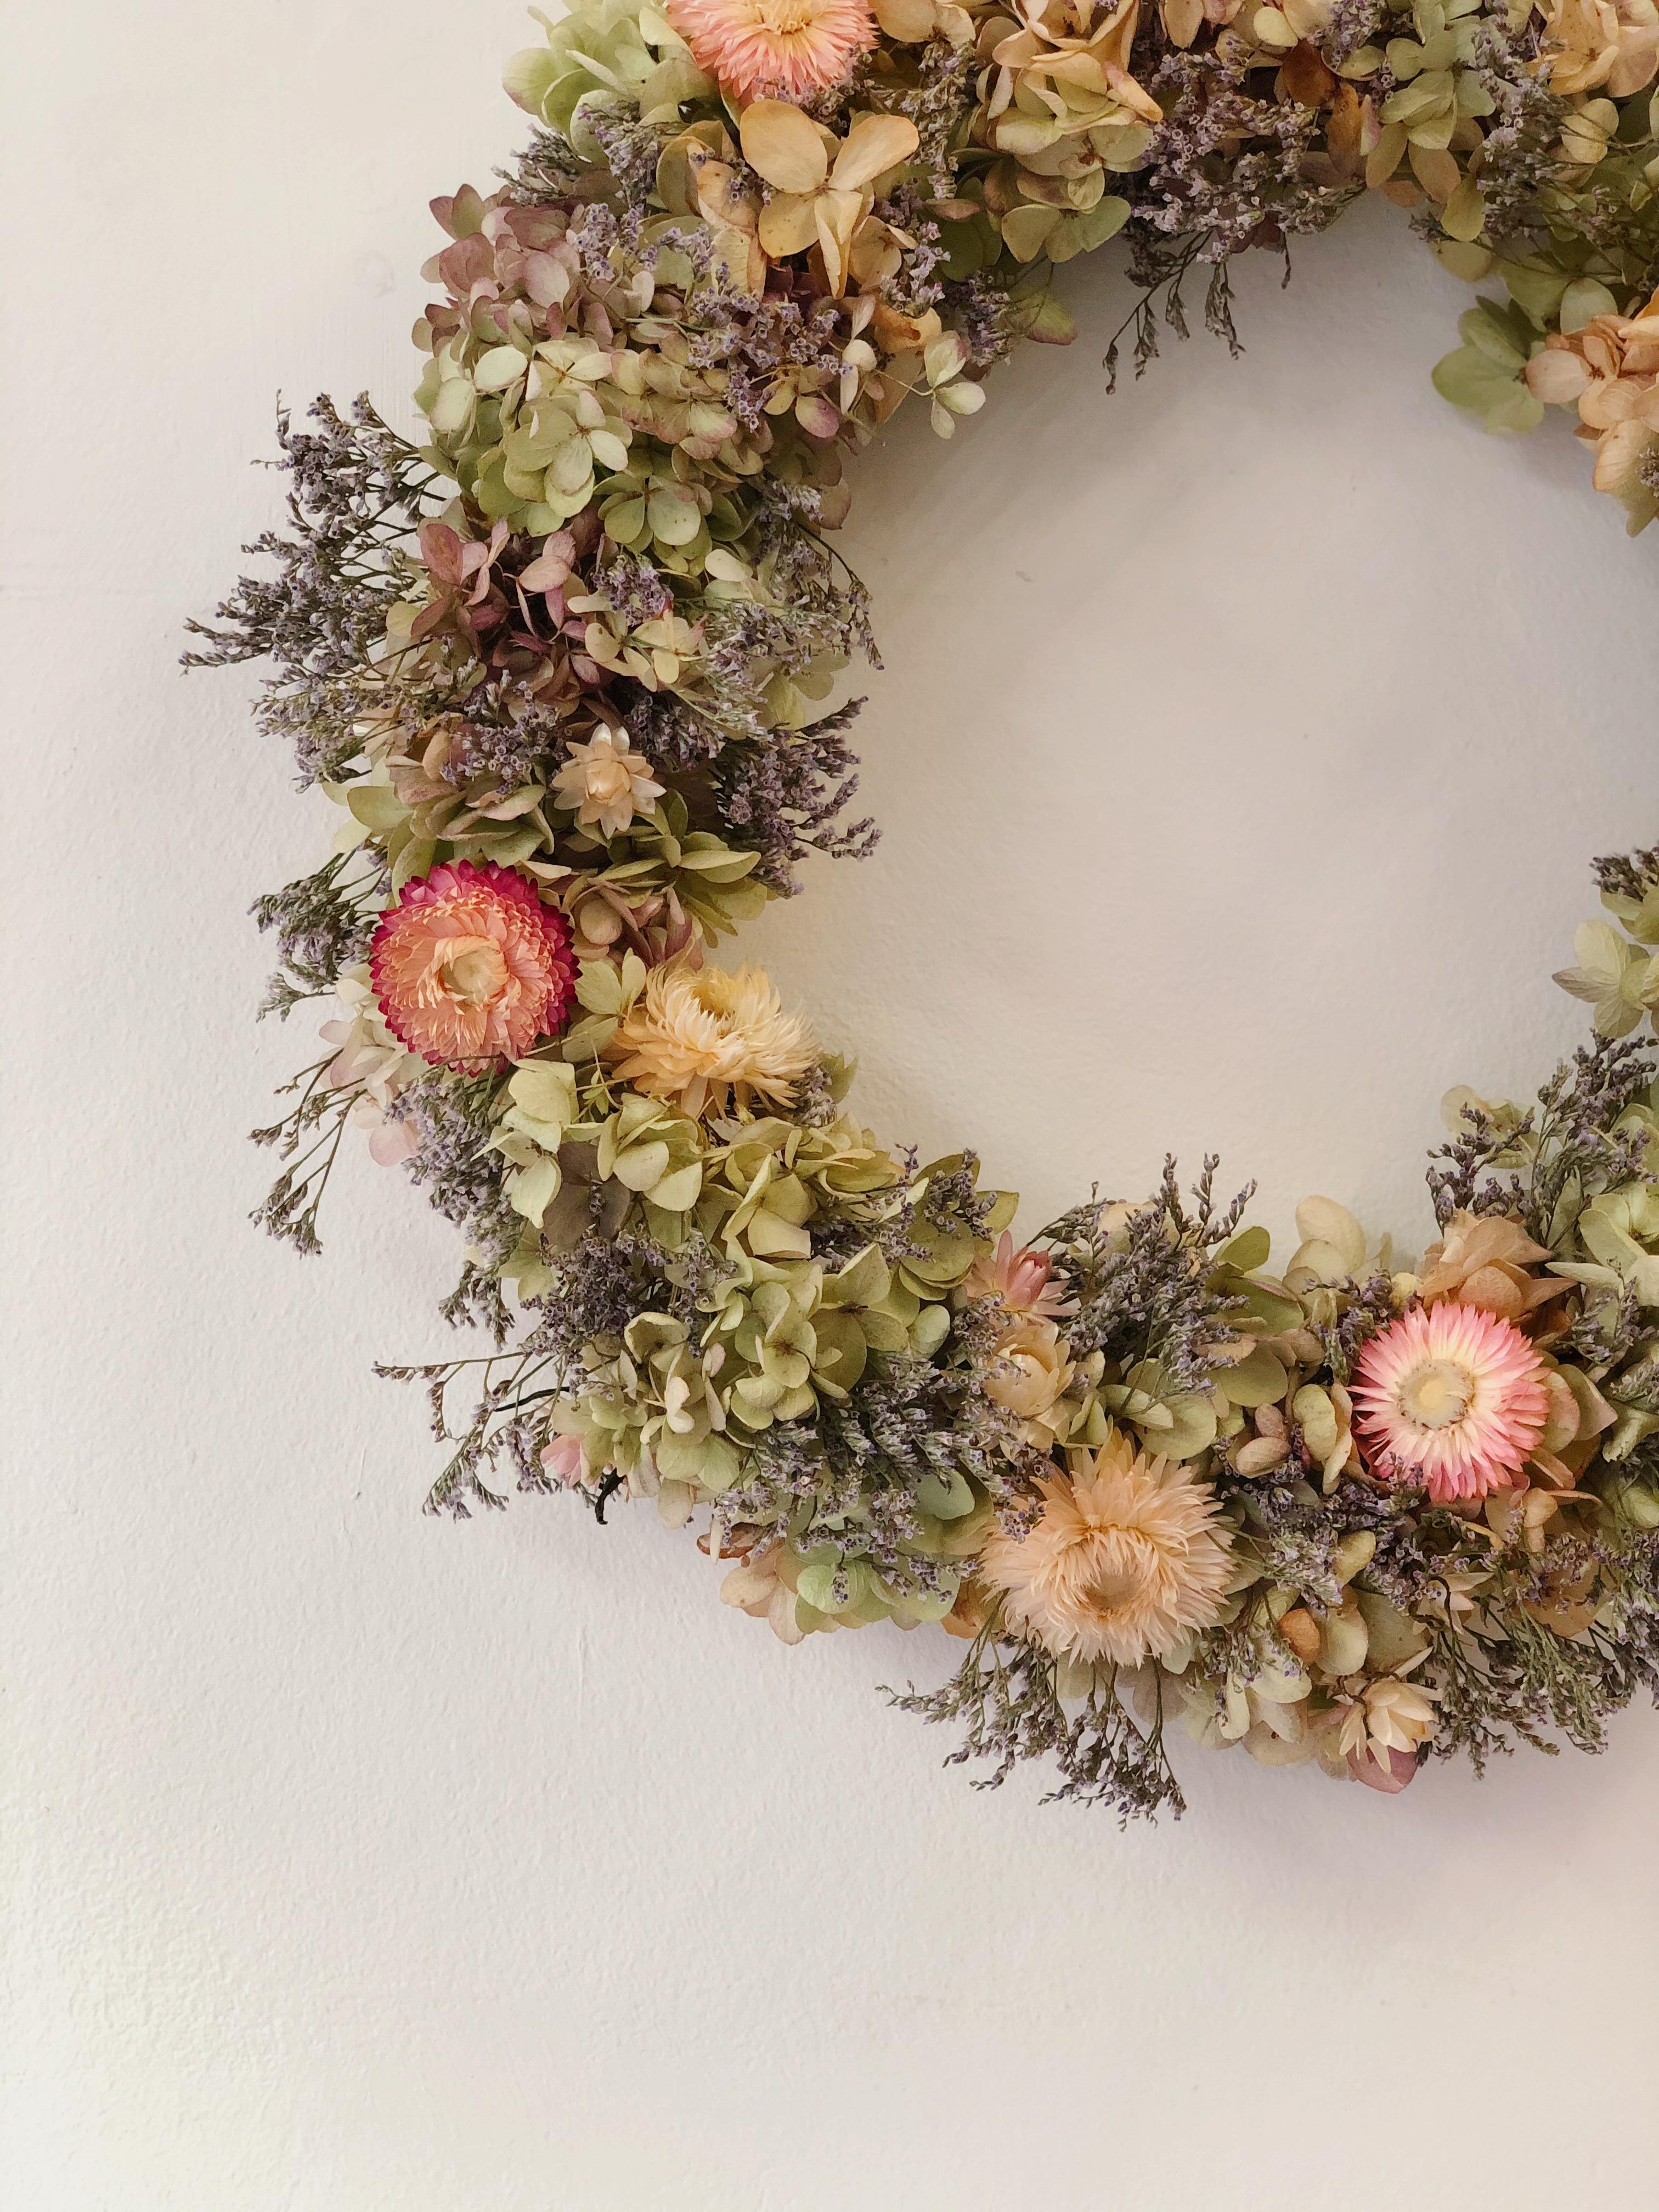 Dried flower wreath - Vintage